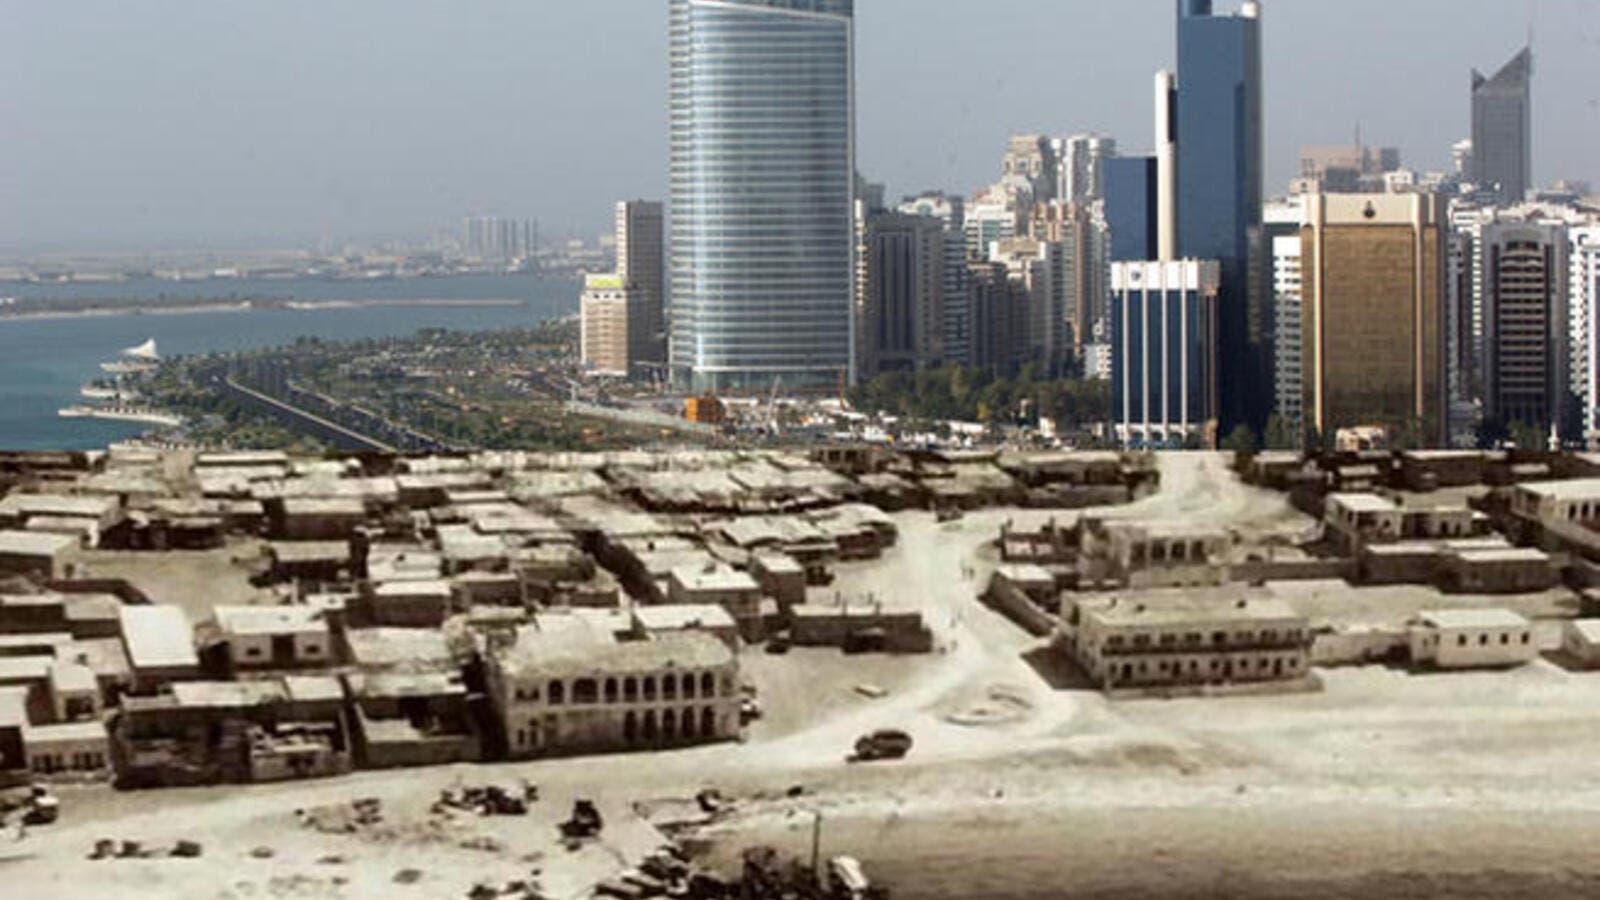 8 luxury Italian firms set up base in Abu Dhabi | Al Bawaba